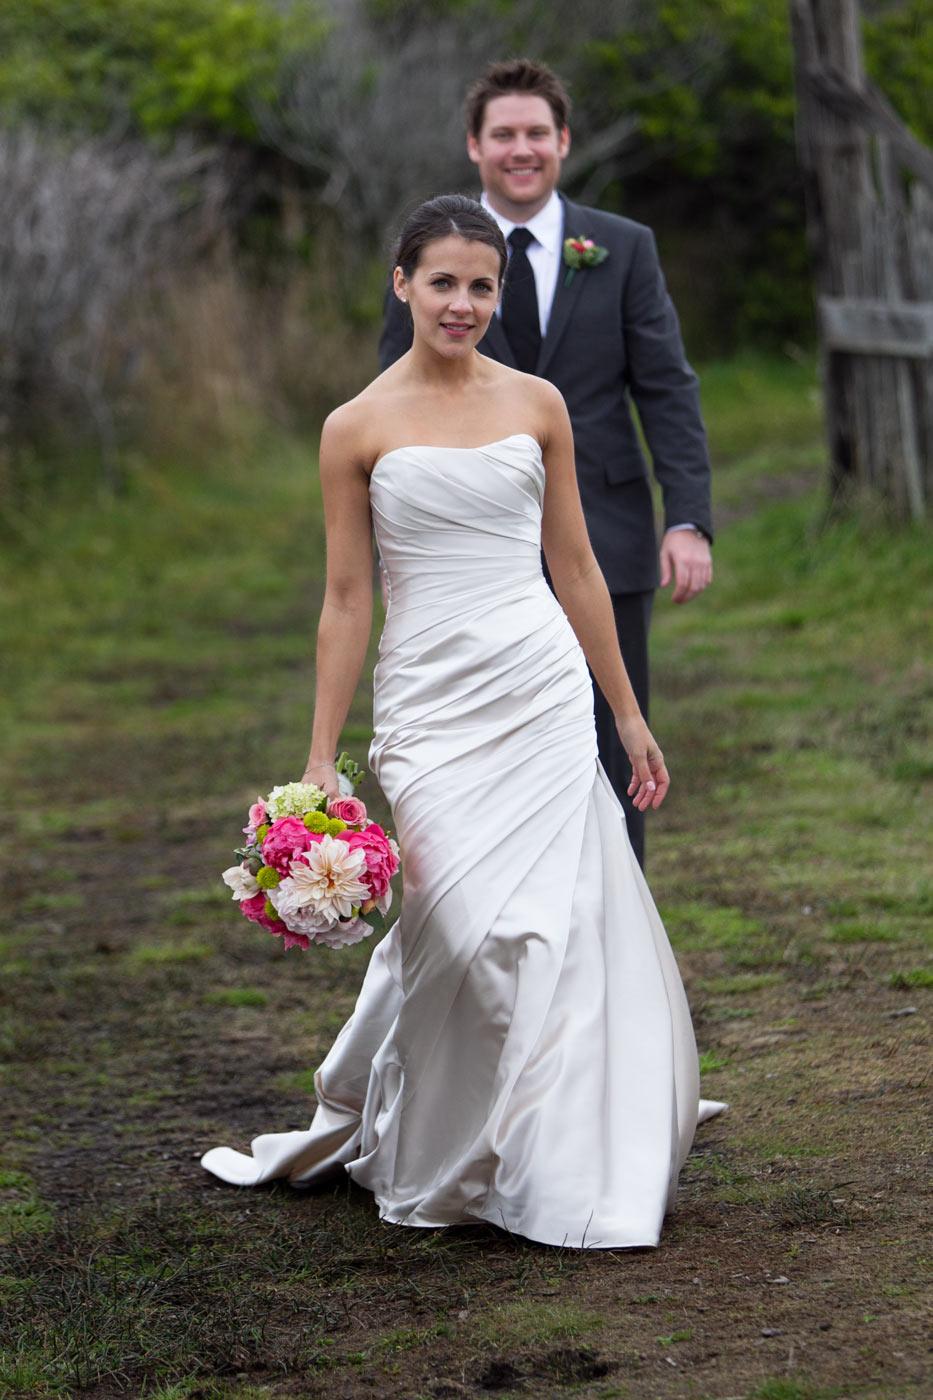 Graham radman wedding